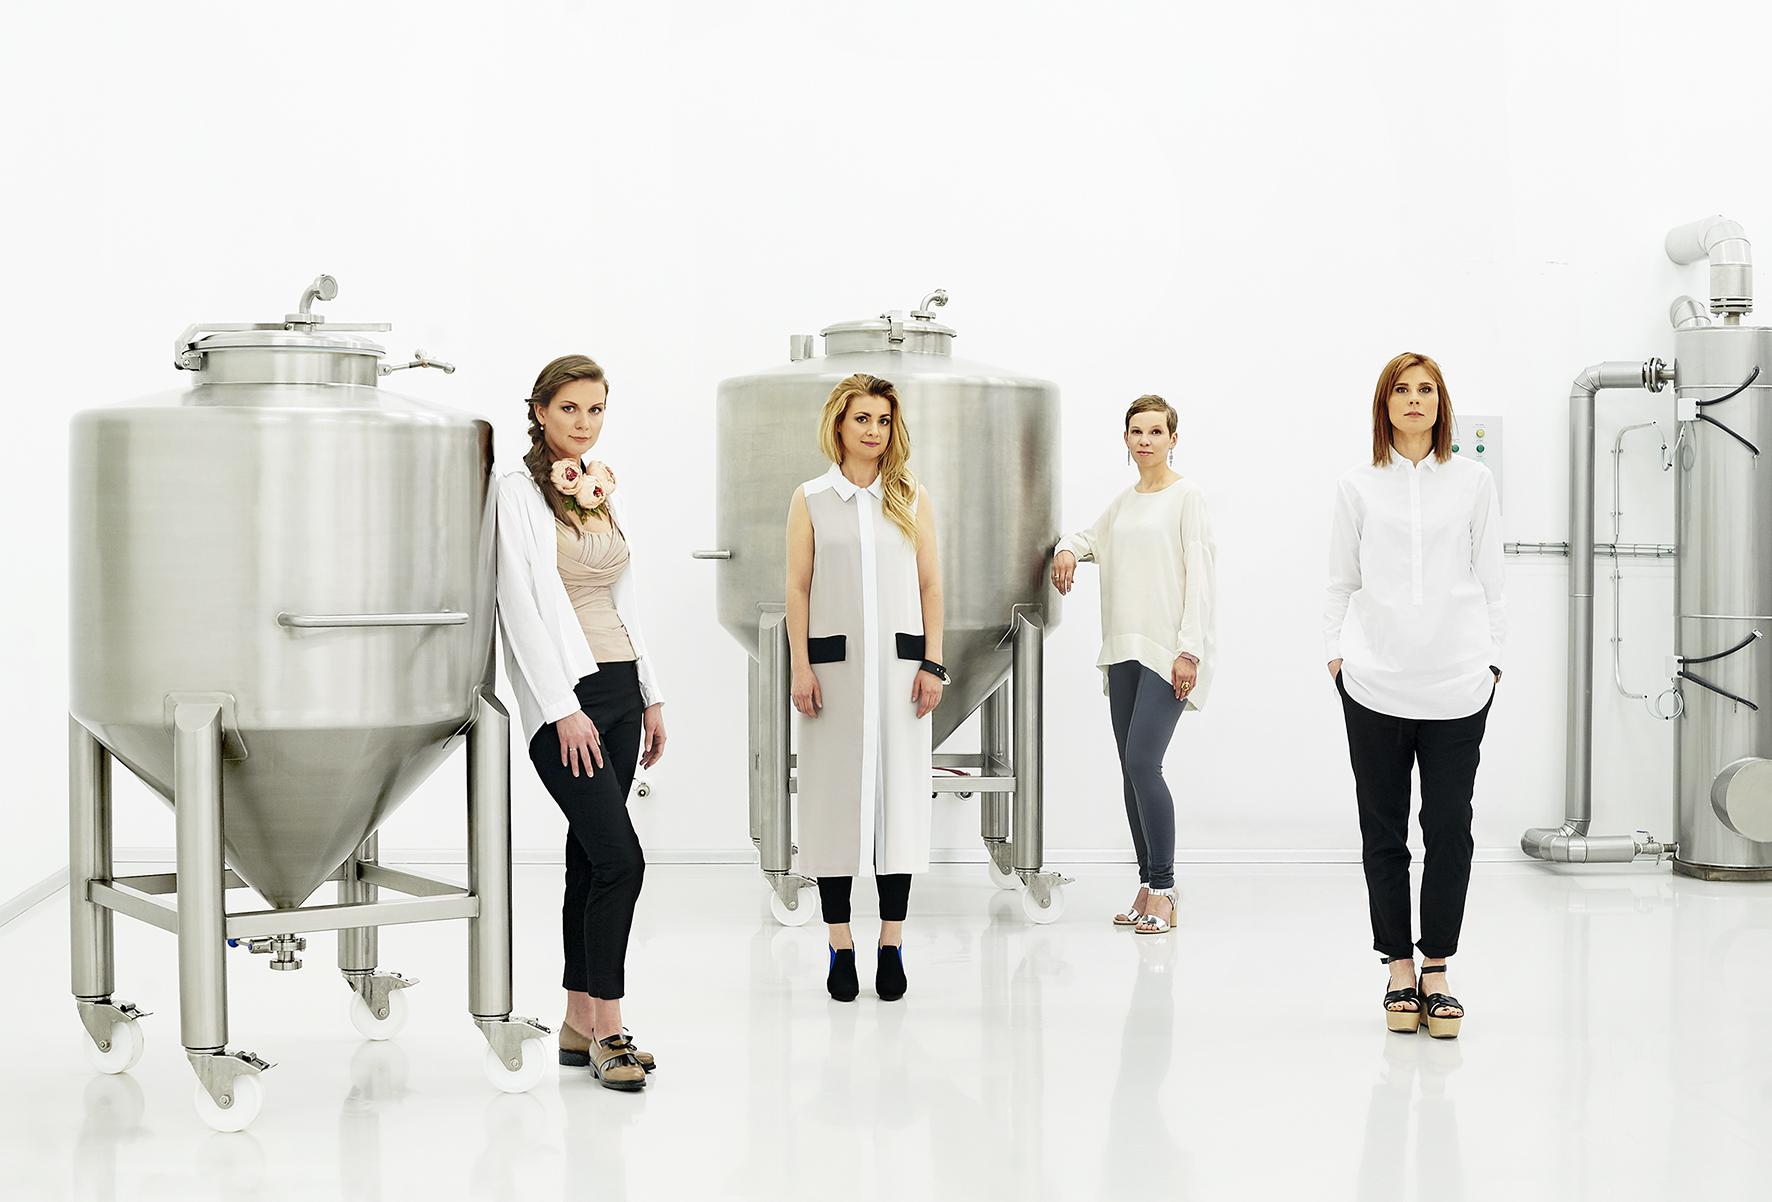 MADARA-Cosmetics-founders-Paula-Lotte-Zane-Liene(2)